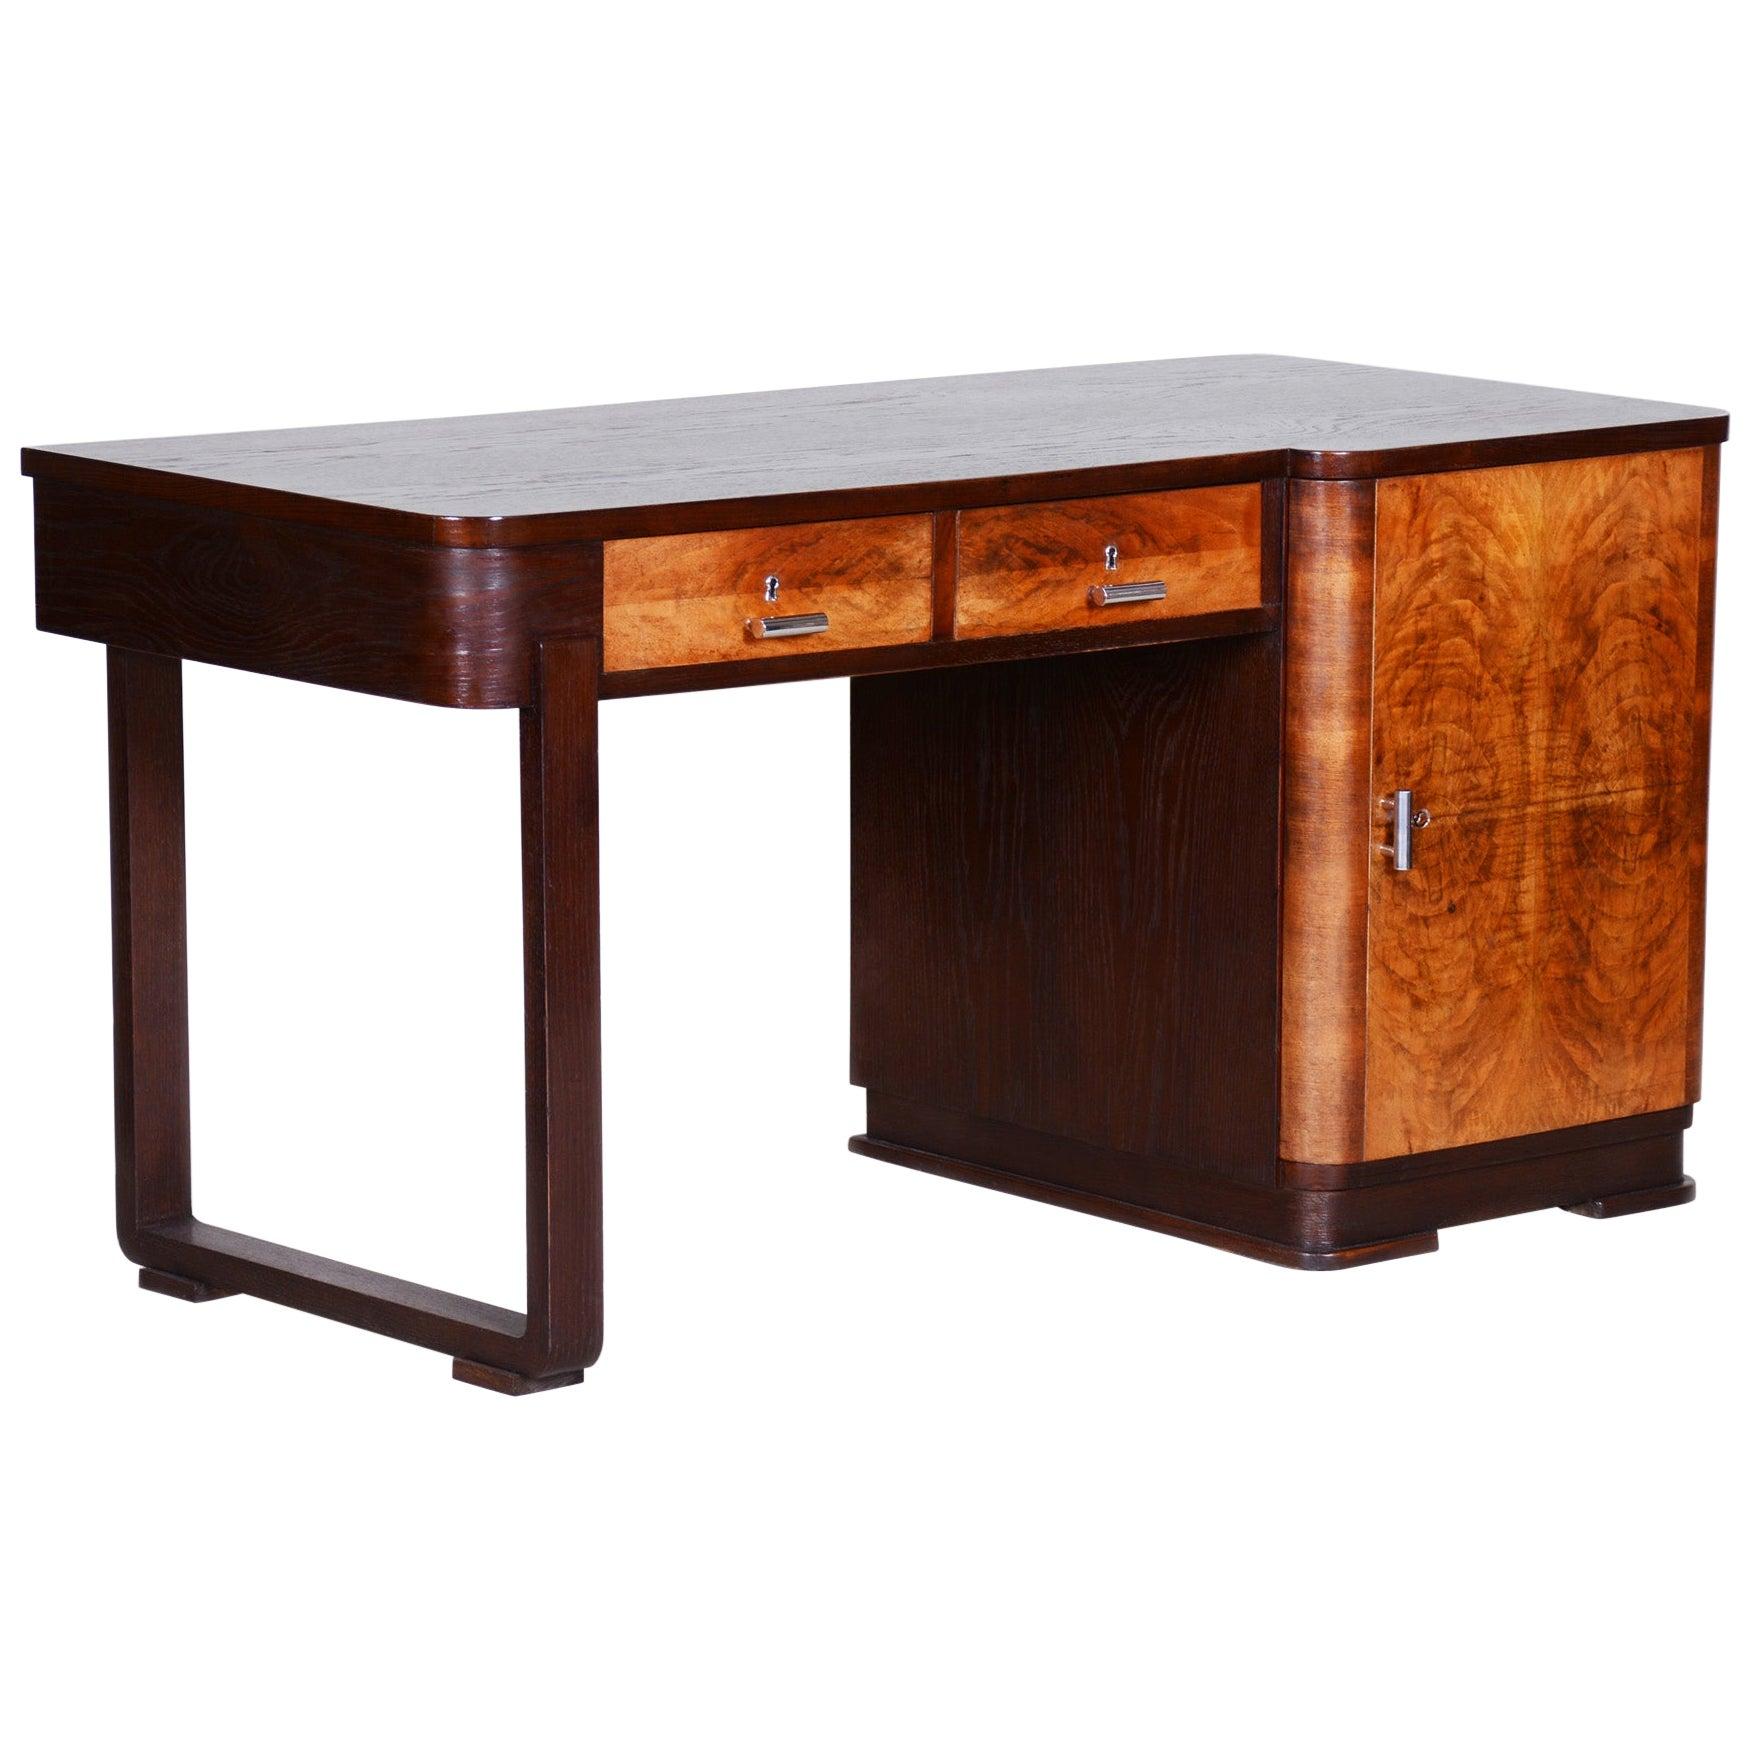 Unusual Art Deco Writing Desk, Oak and Walnut Veneer, Czechia 'Bohemia', 1930s